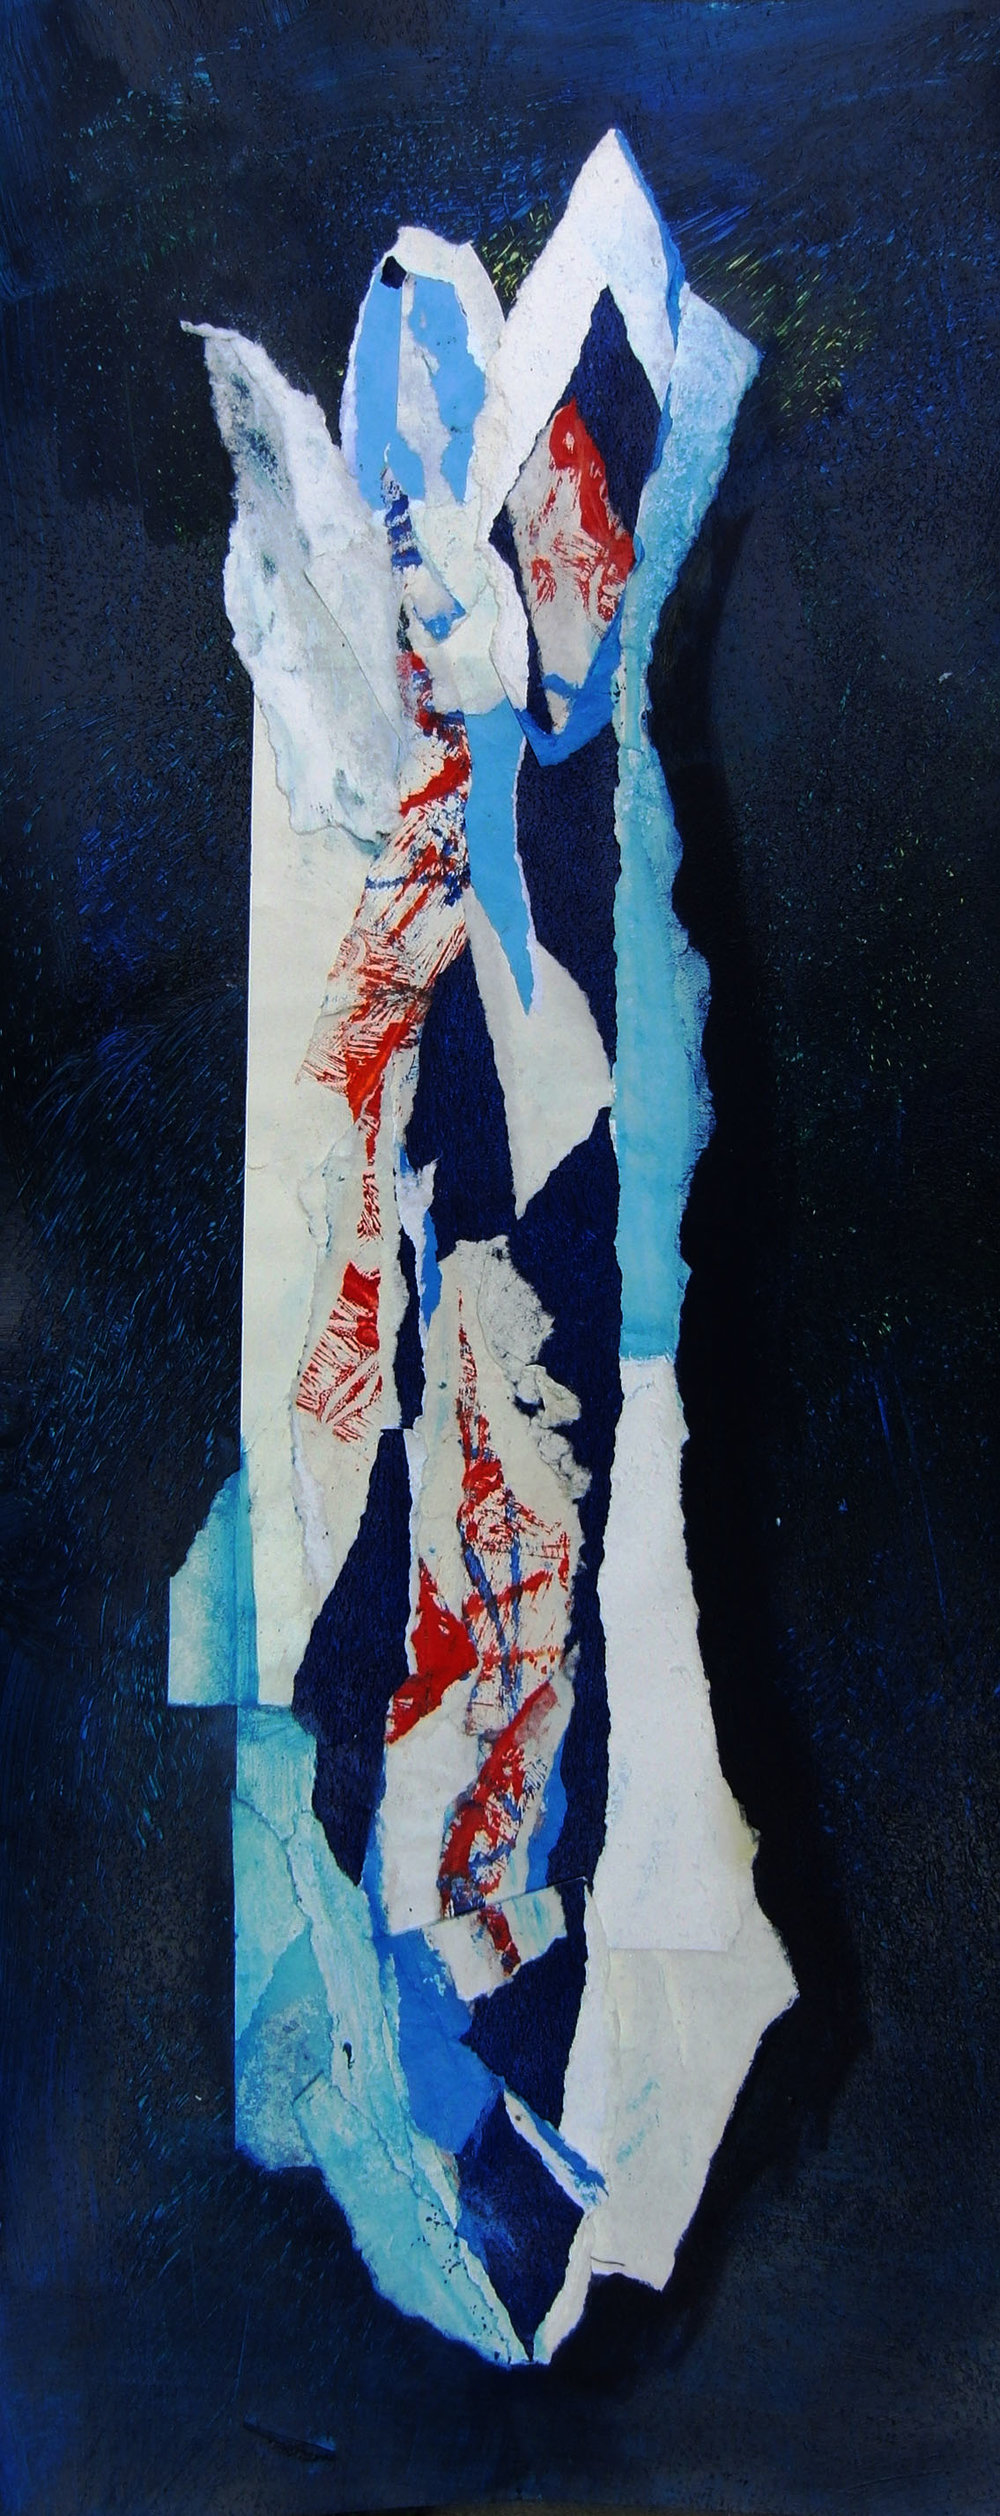 "Sea Bird No. 1,  2015, monotype, collage, 9"" x 16"" (23cm x 41cm), private collection, Paris, France"